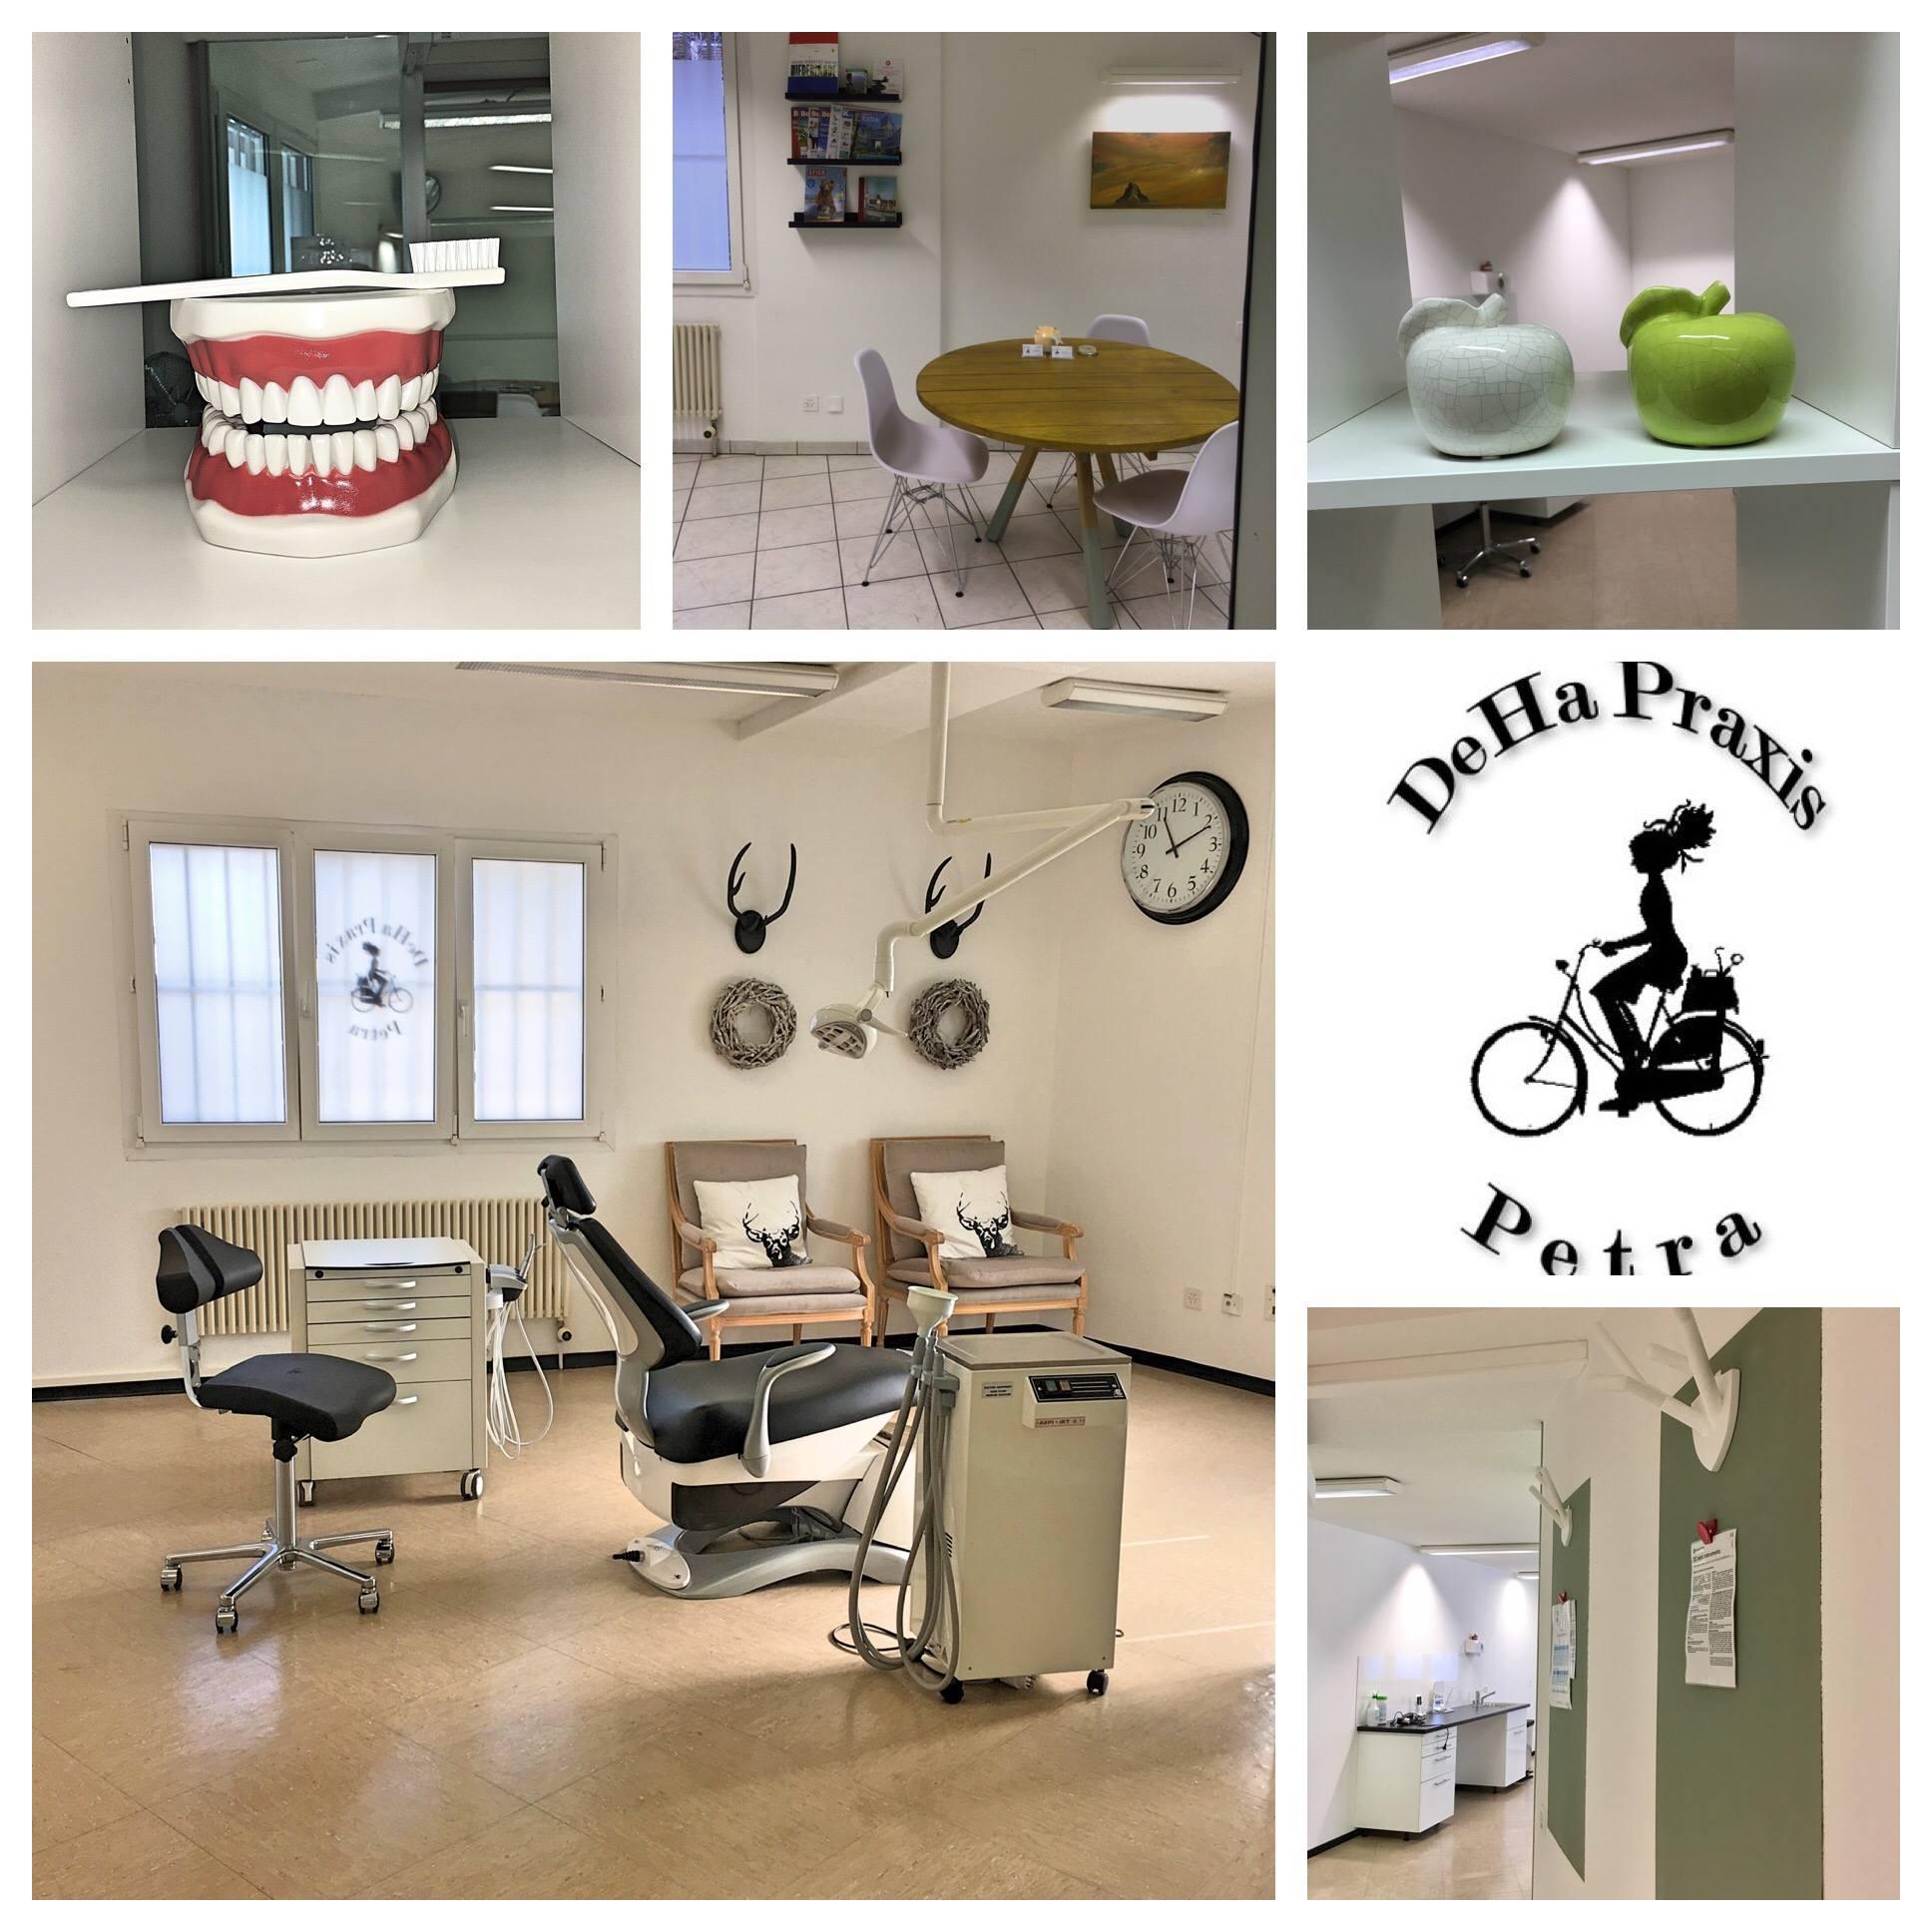 DeHa Praxis Petra - Dentalhygiene